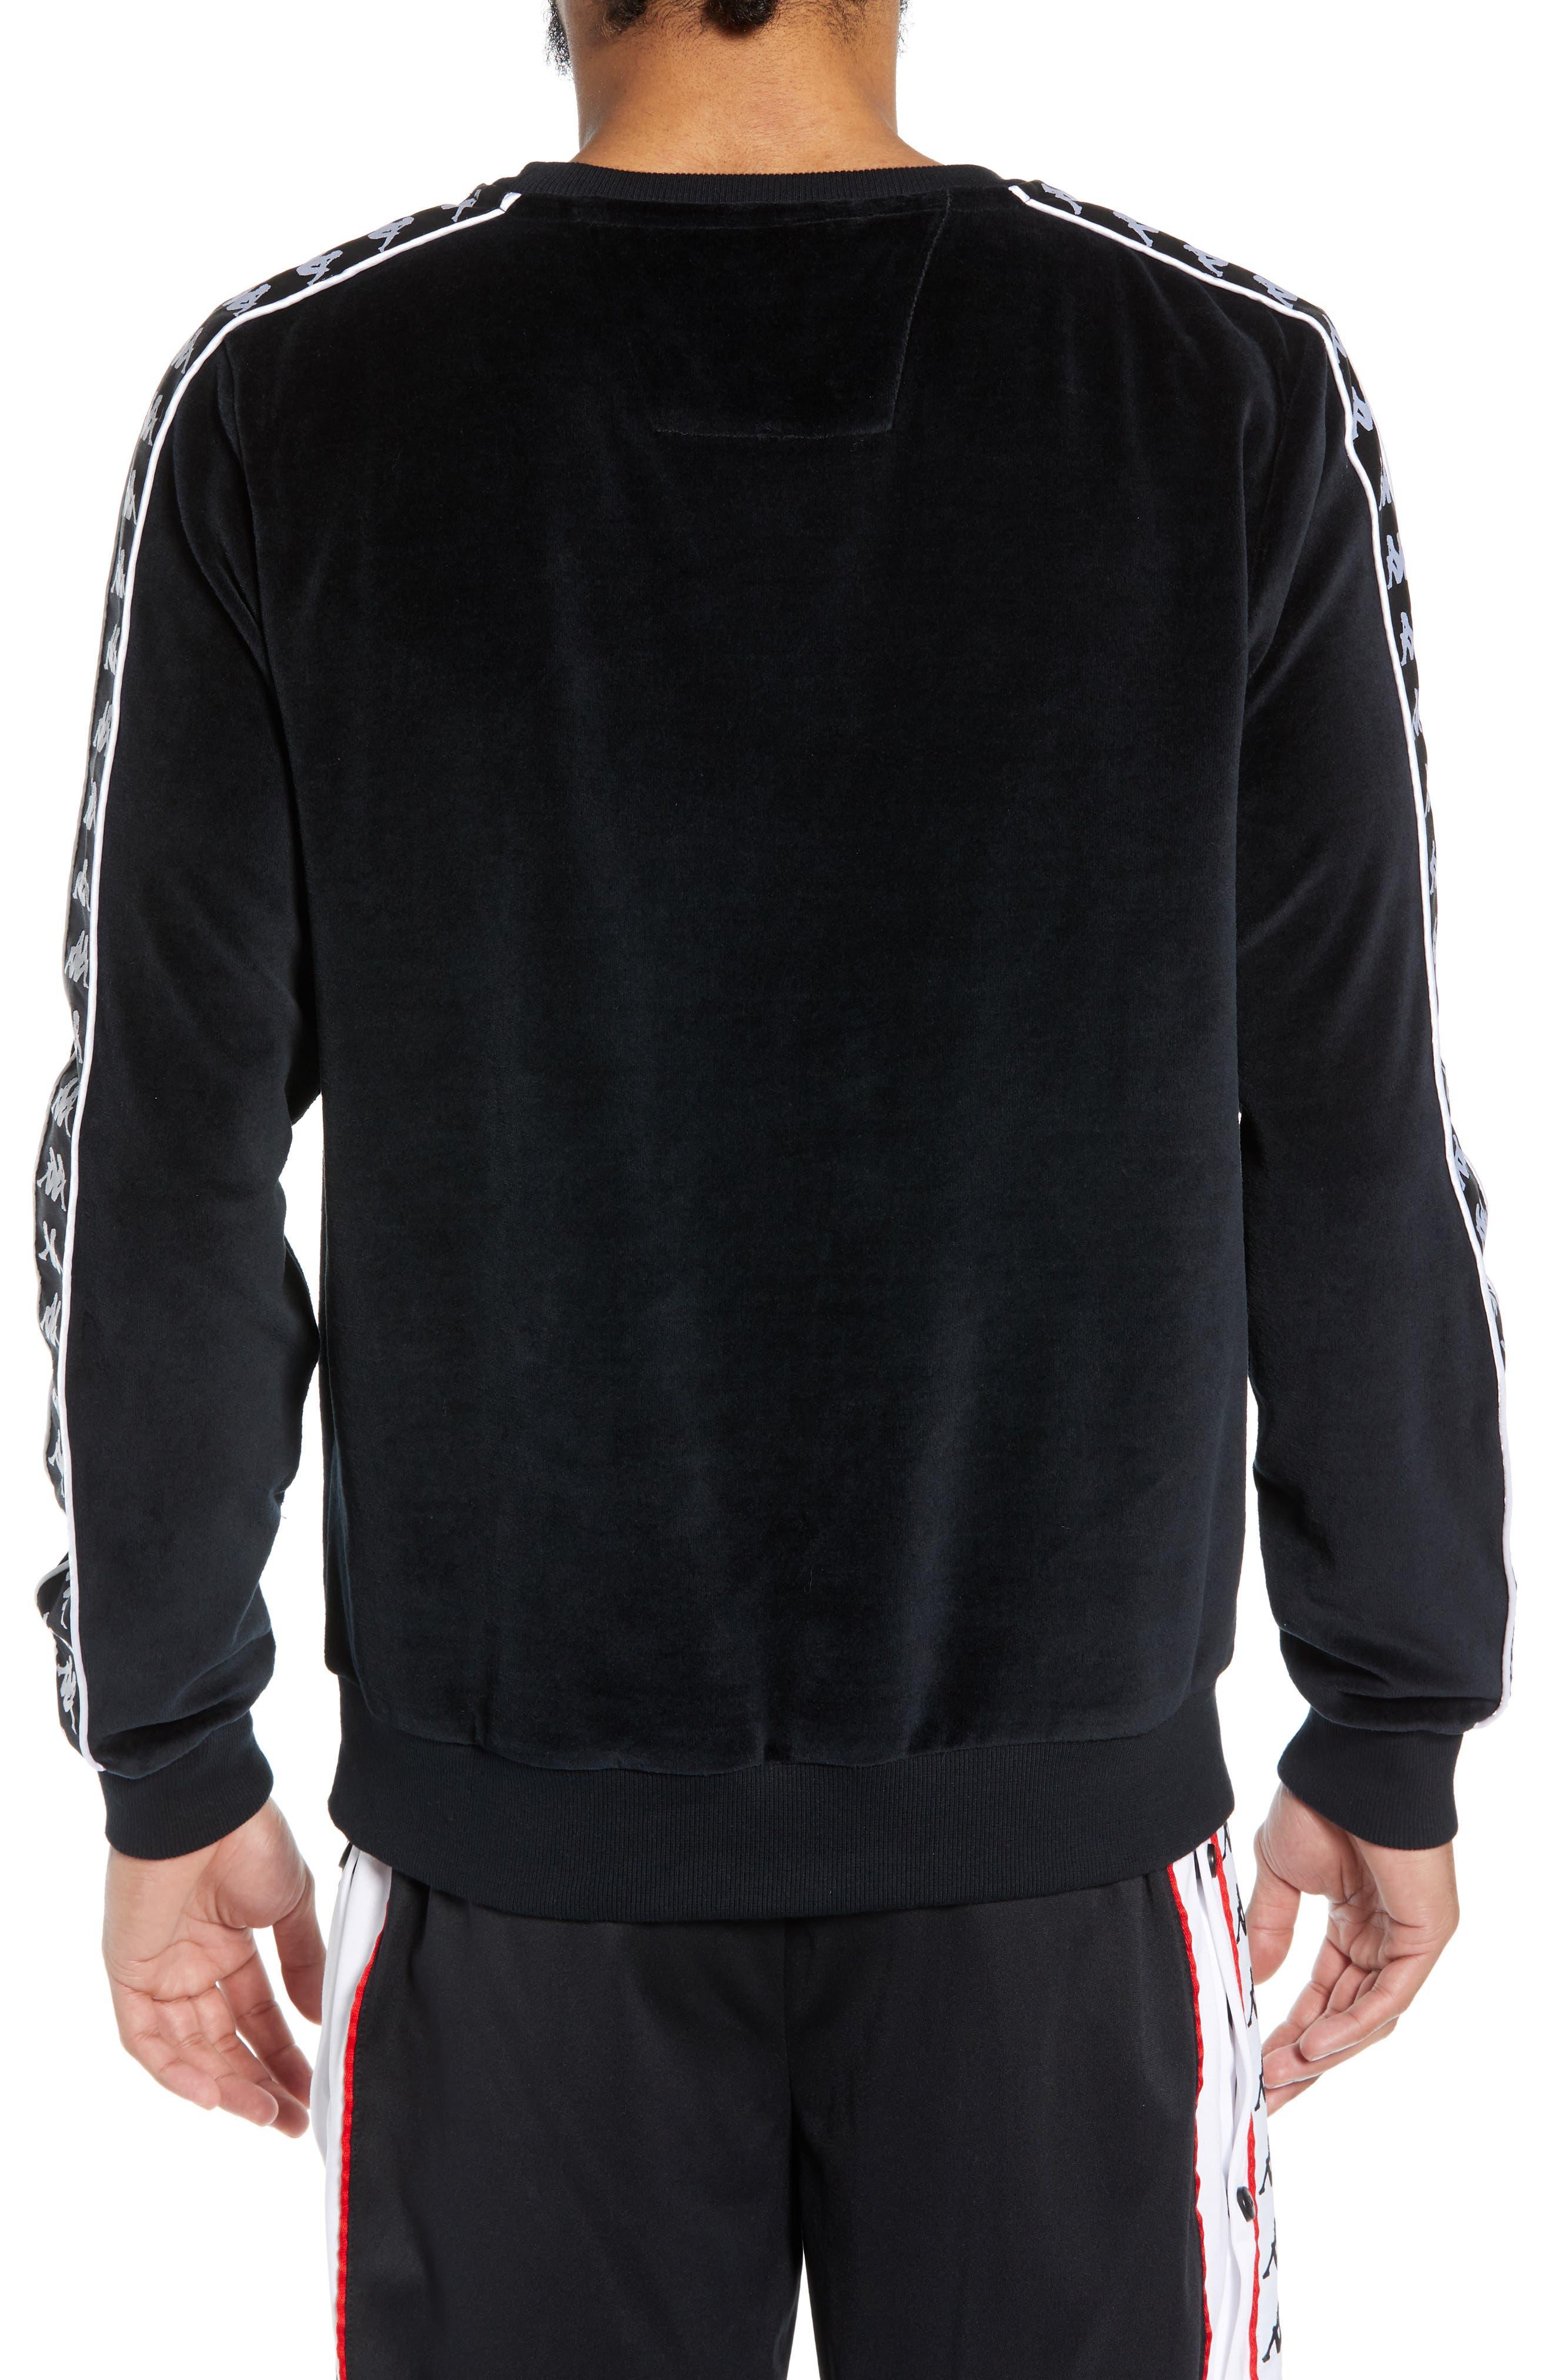 KAPPA,                             Authentic Aynset Velour Crewneck Sweatshirt,                             Alternate thumbnail 2, color,                             001